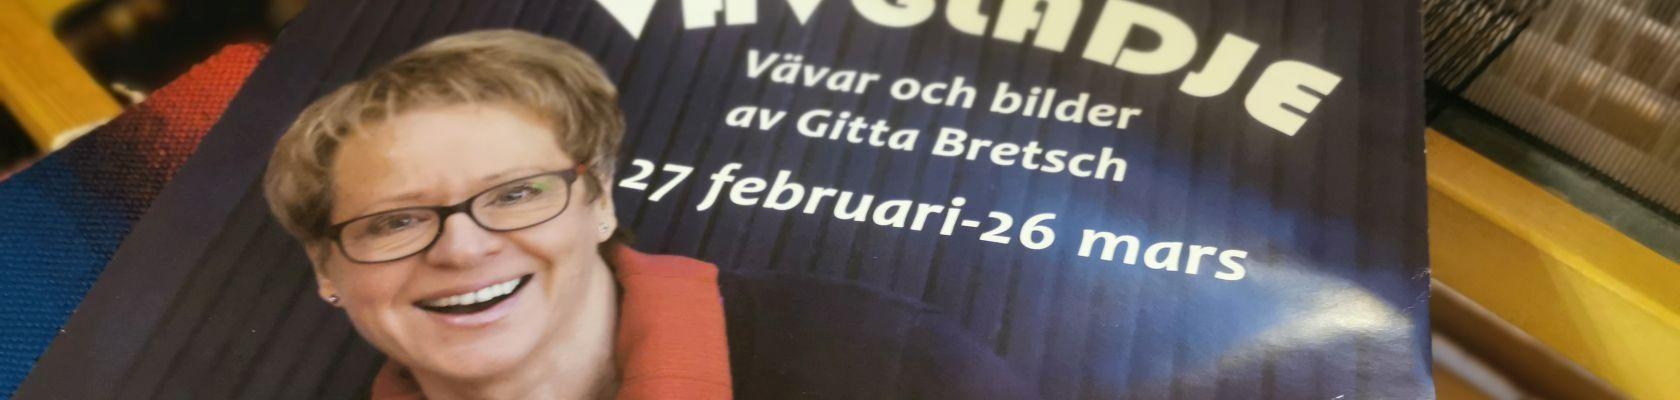 Ausstellung-vaevglaedje-Gittas-verkstad